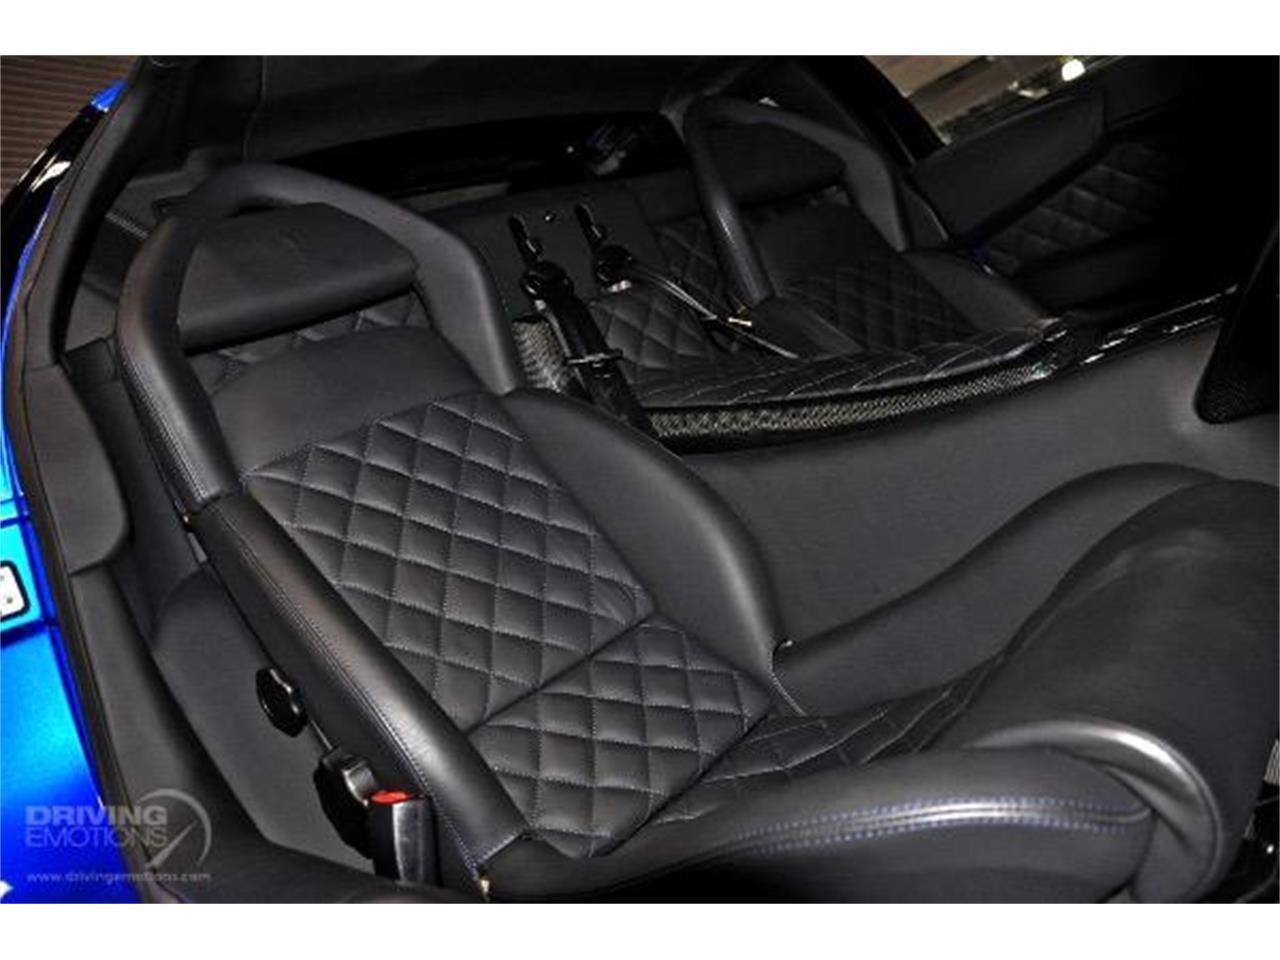 Large Picture of '08 Lamborghini Murcielago located in West Palm Beach Florida - $289,900.00 - QQLZ